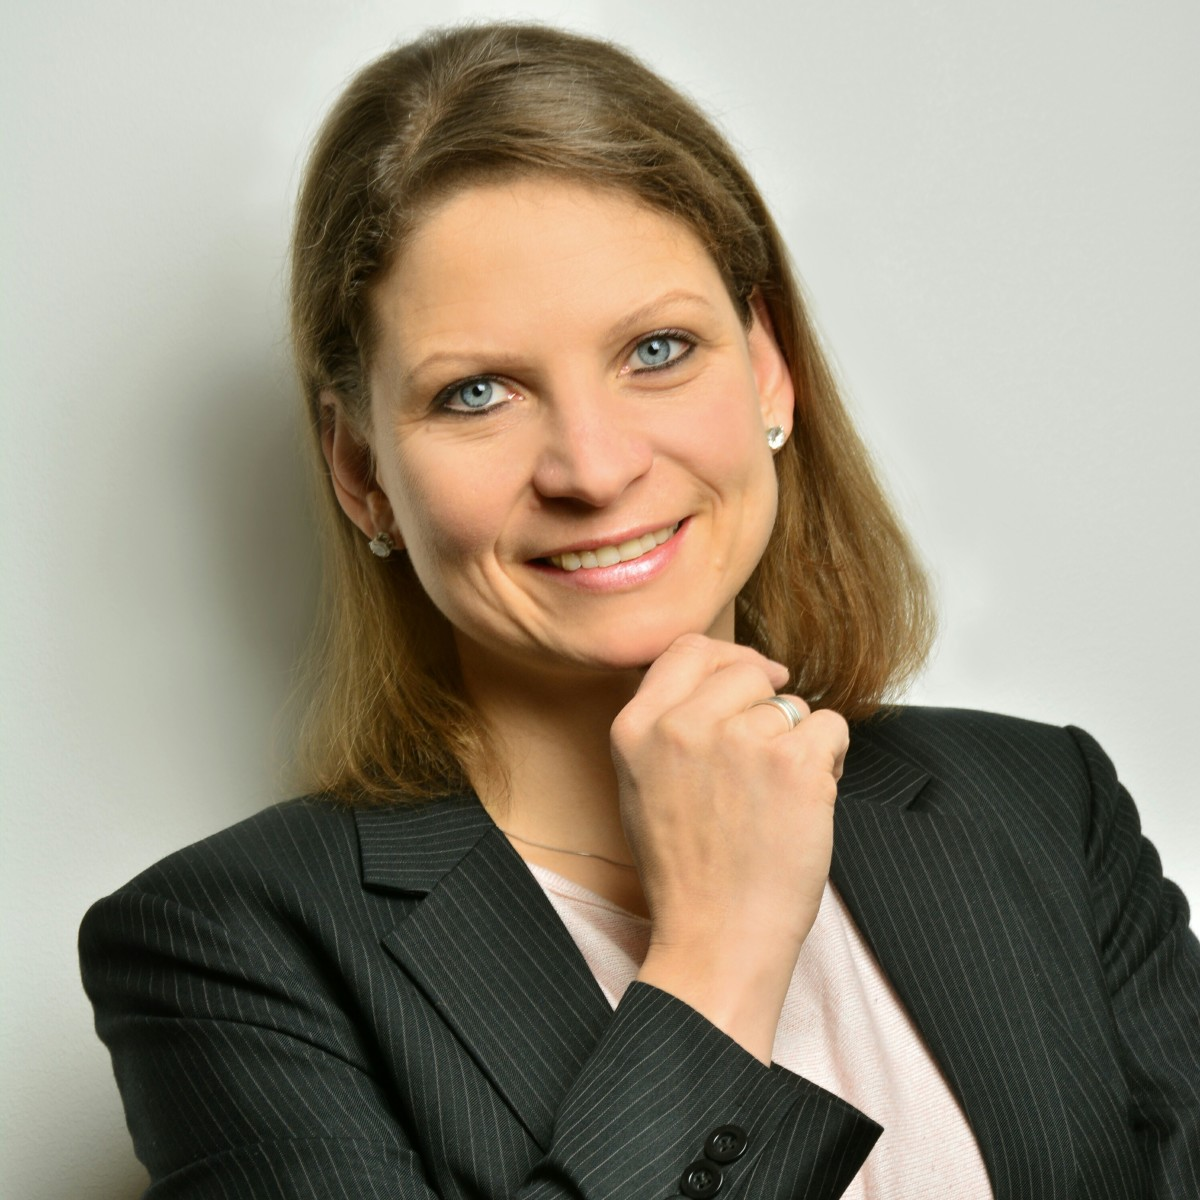 Claudia Rau